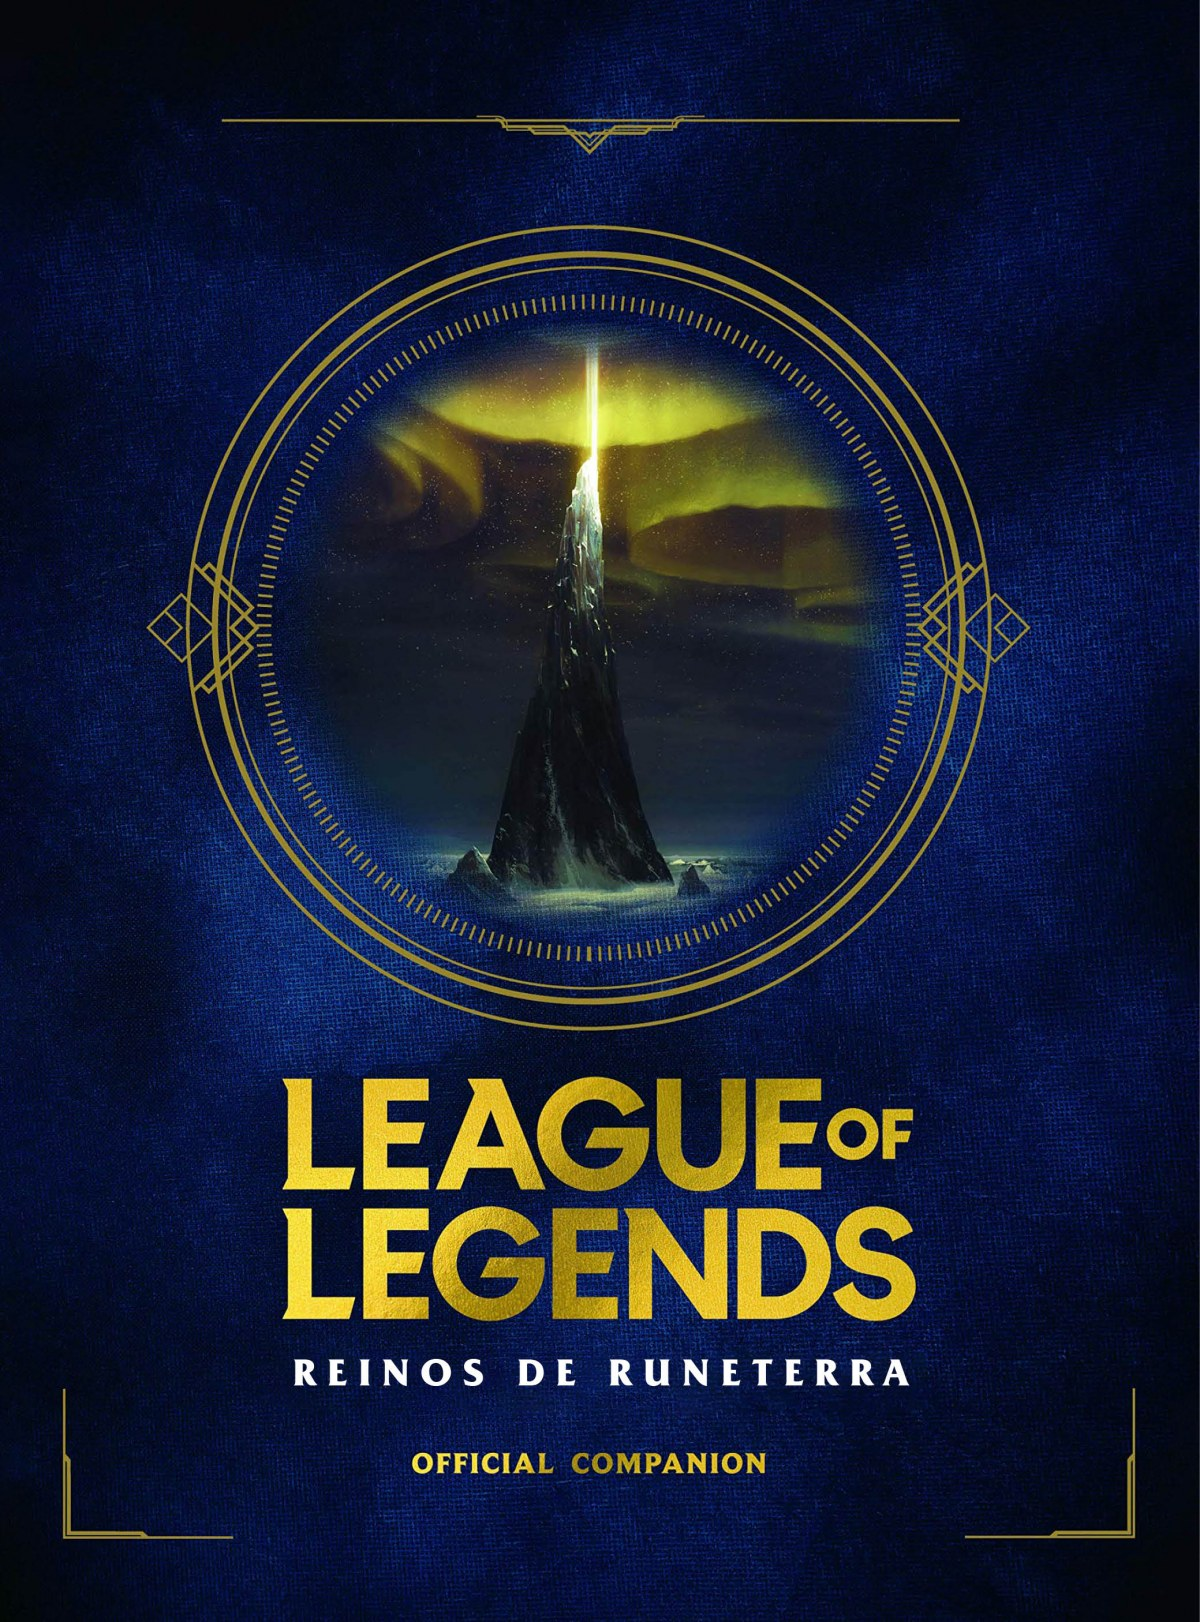 League of Legends. Reinos de Runaterra